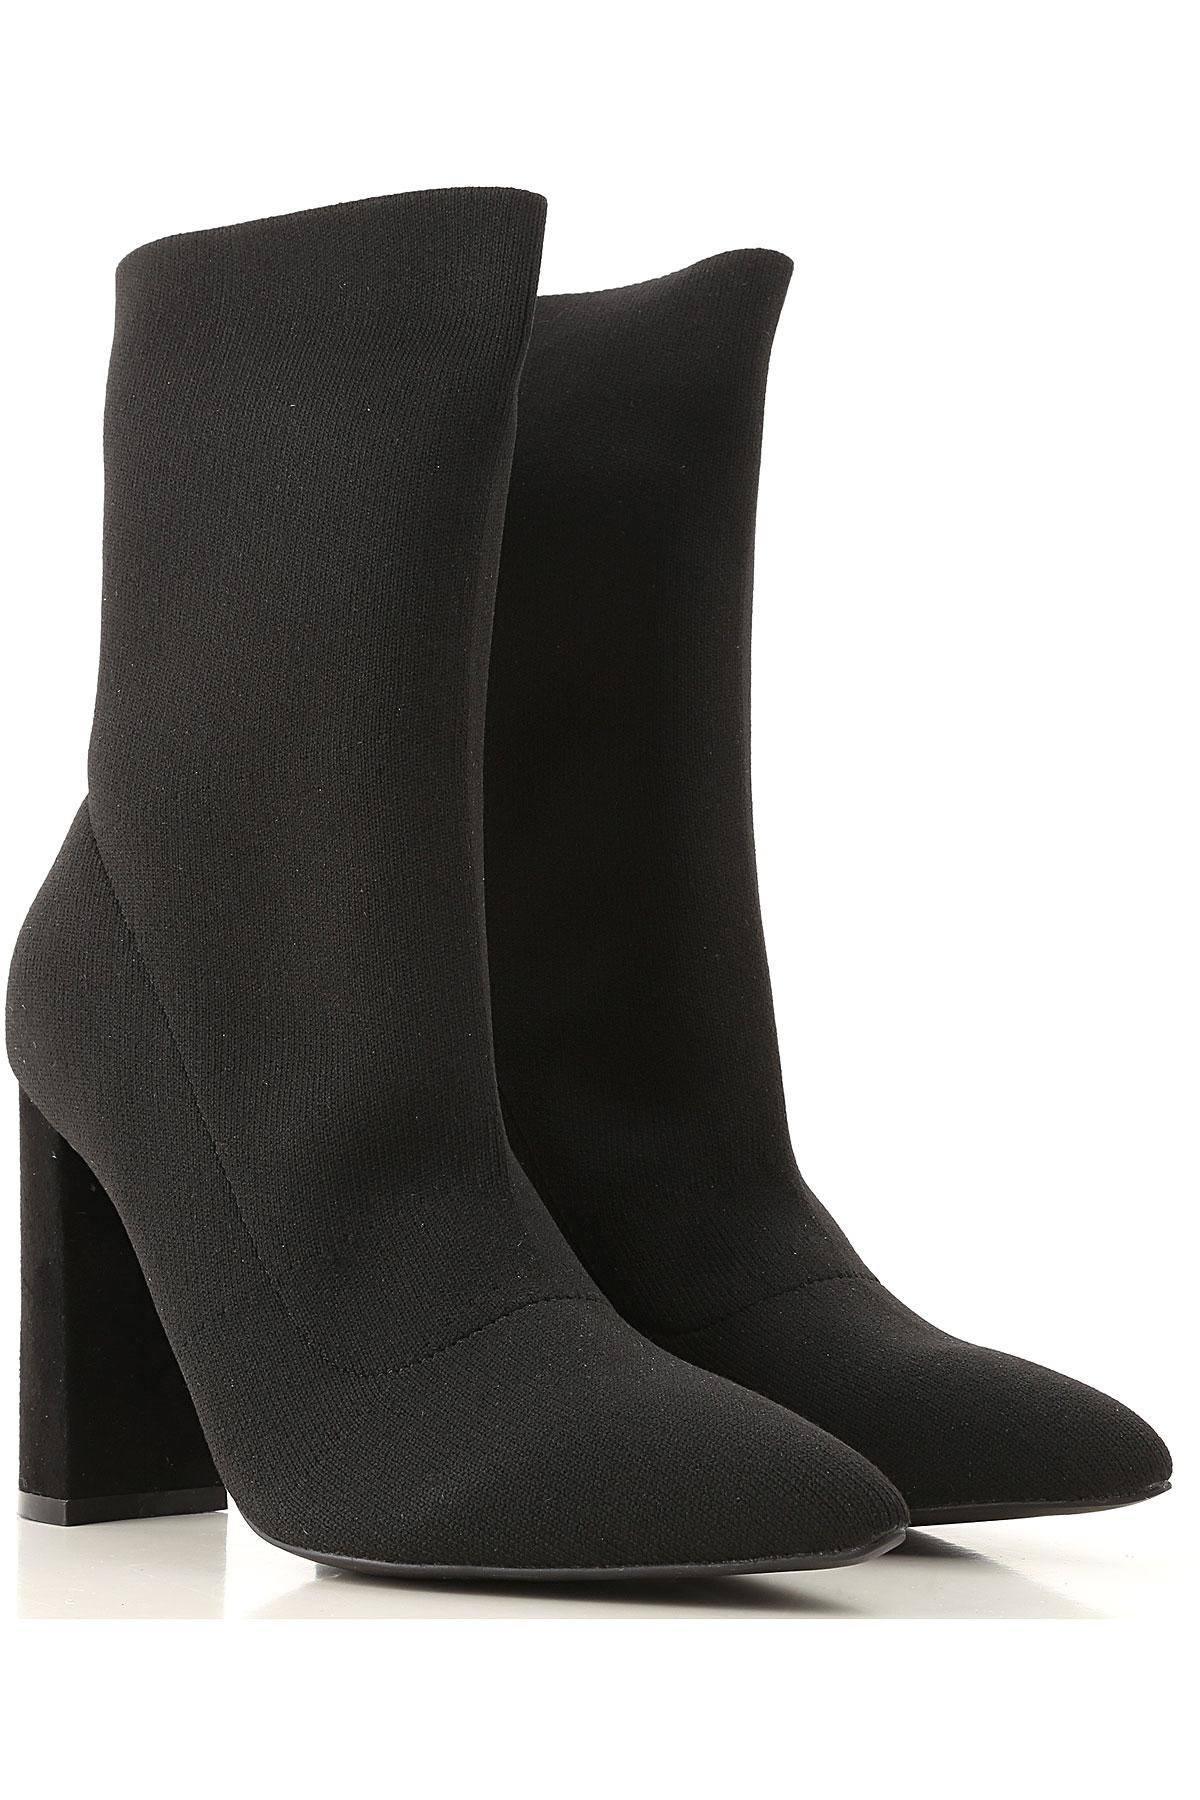 Kendall Kylie Boots for Women, Booties On Sale in Outlet, Black, Textile, 2019, US 10 (EU 41) US 7 (EU 38) US 9 (EU 40) US 8.5 (EU 39.5) US 6.5 (EU 37